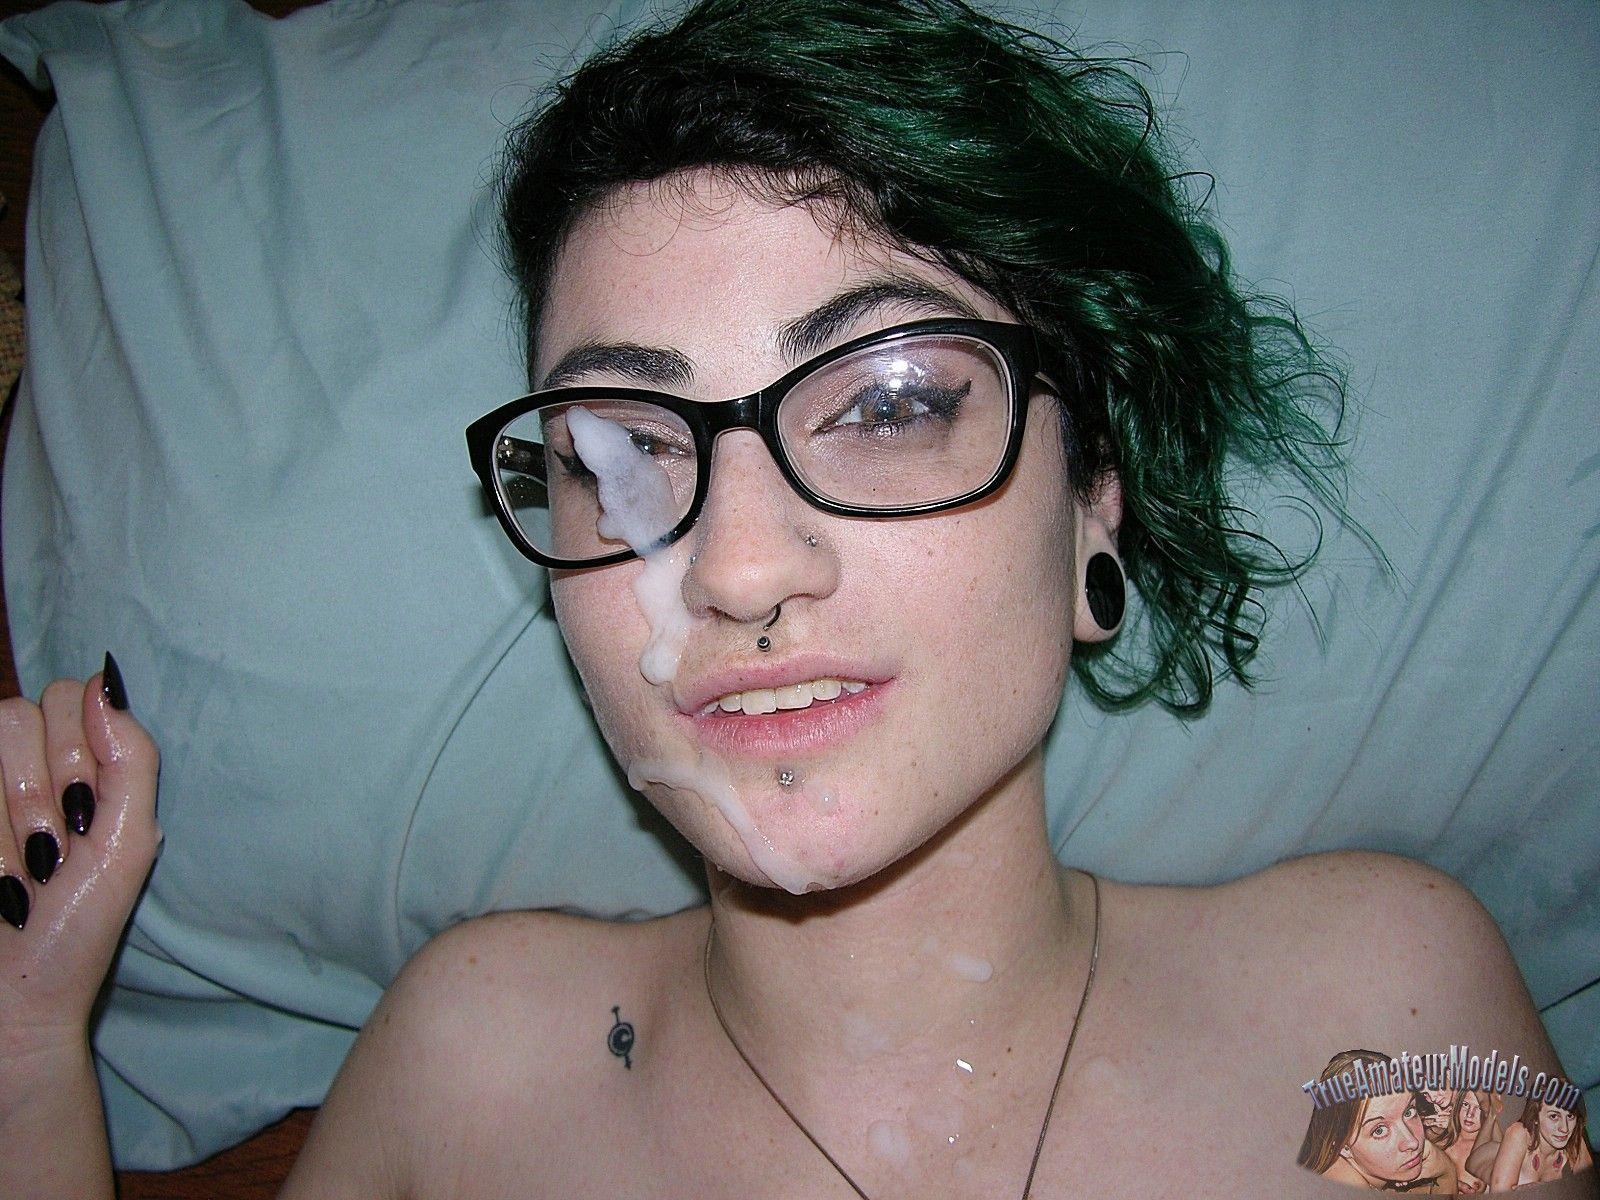 Emo girl takes selfie of facial cumshot on glasses